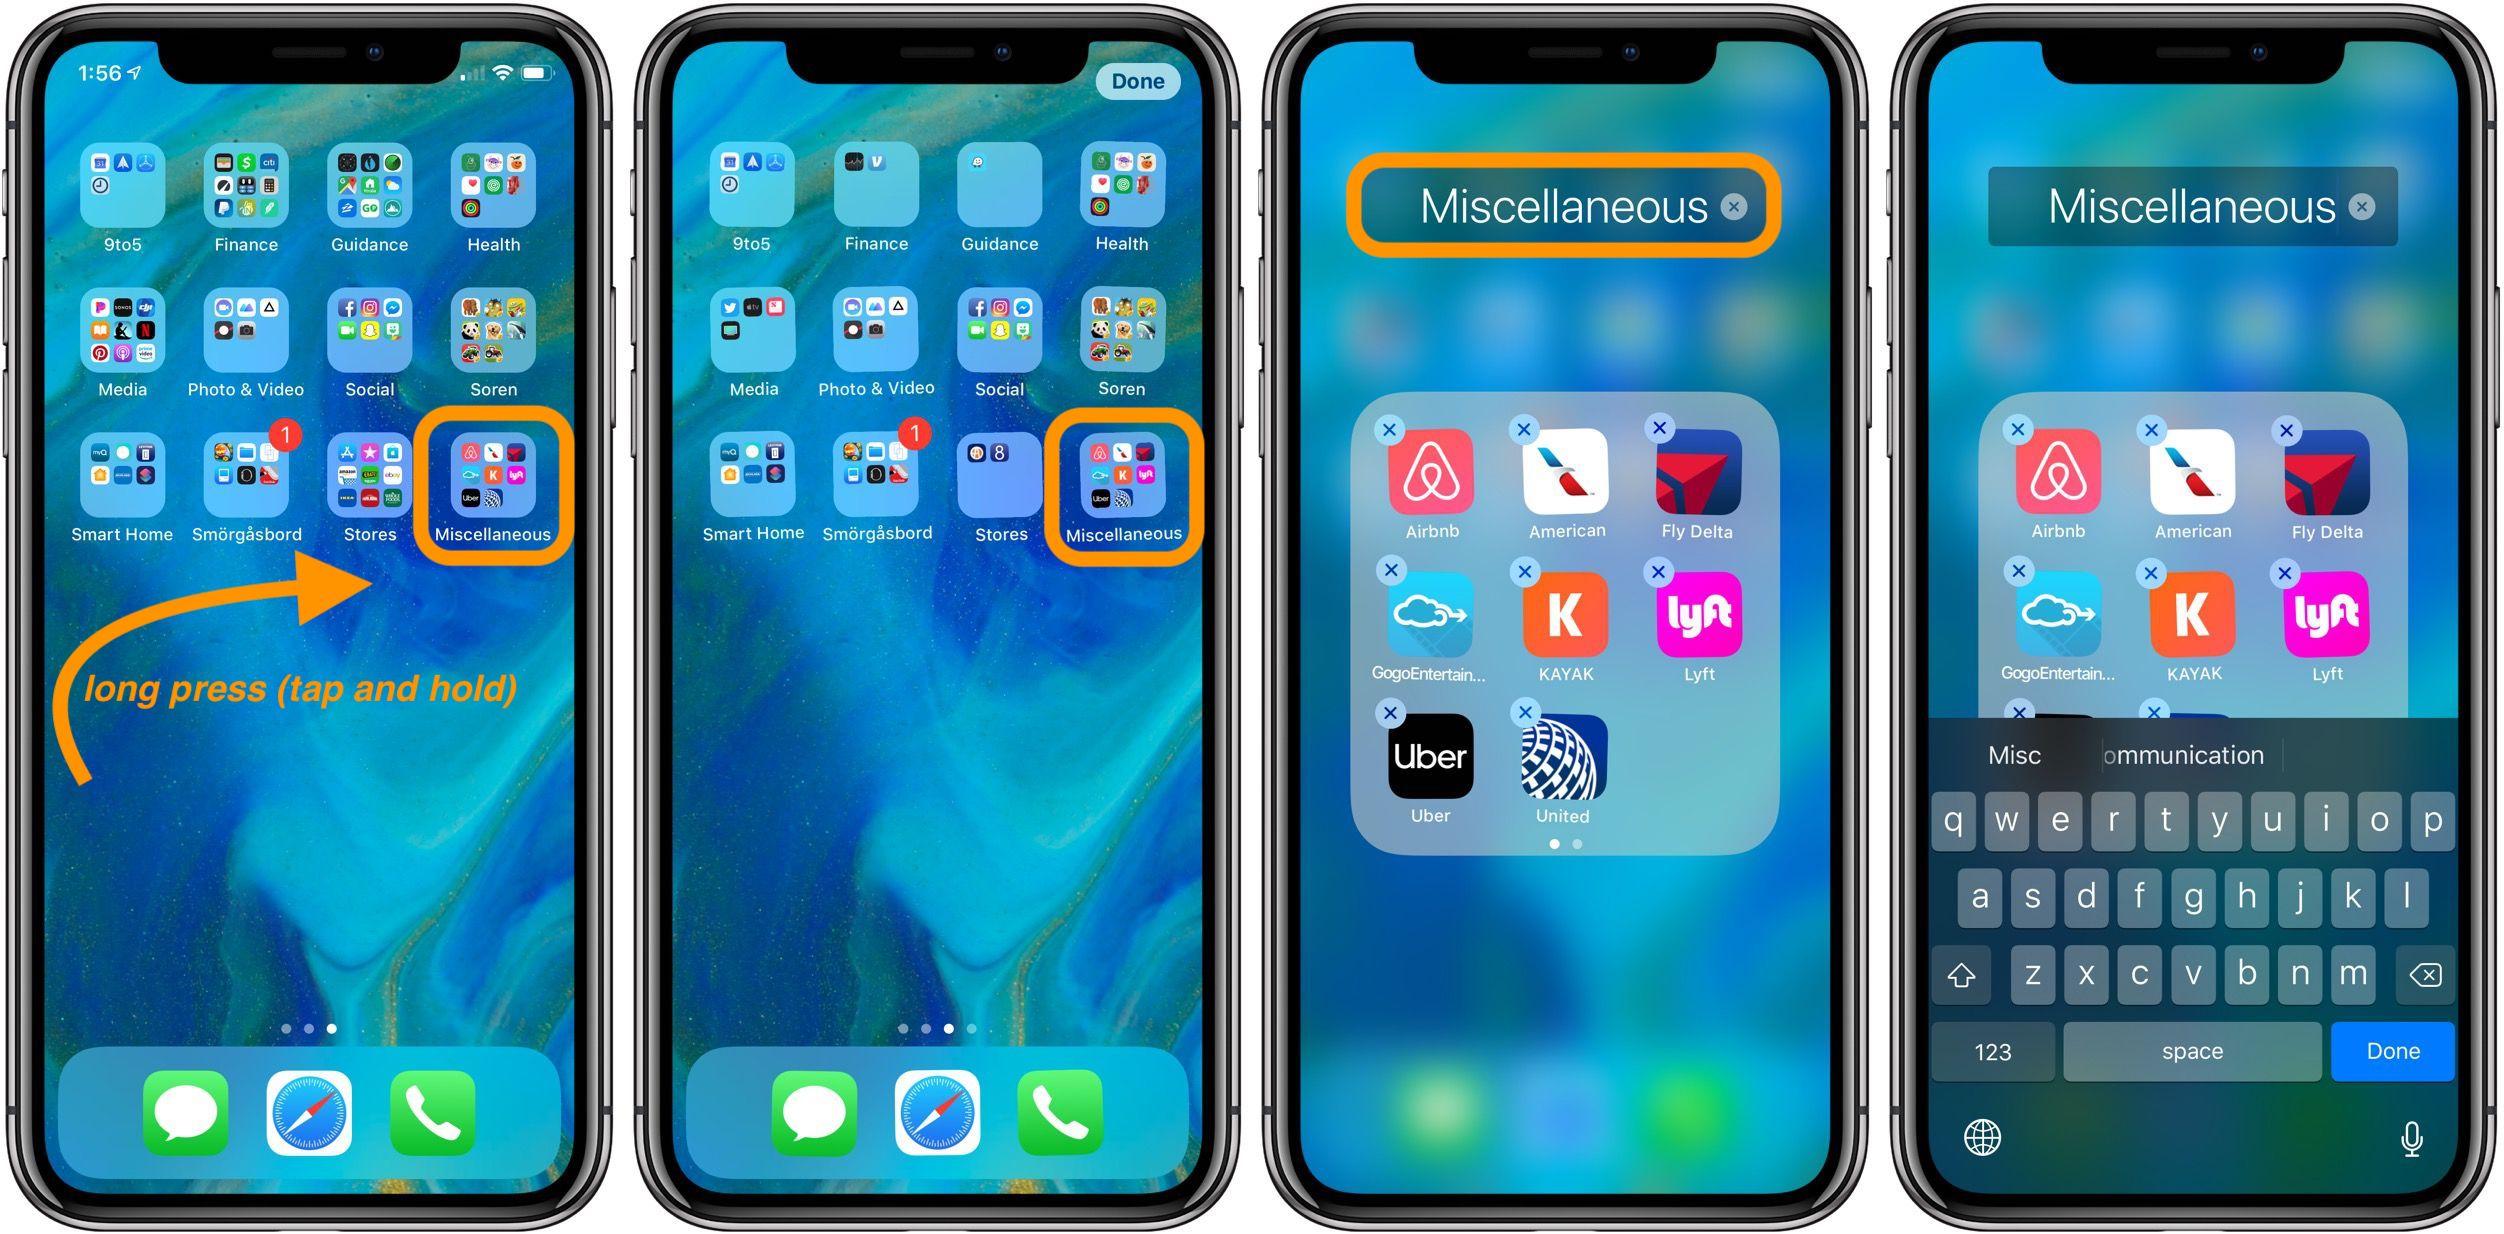 rename folders on iPhone